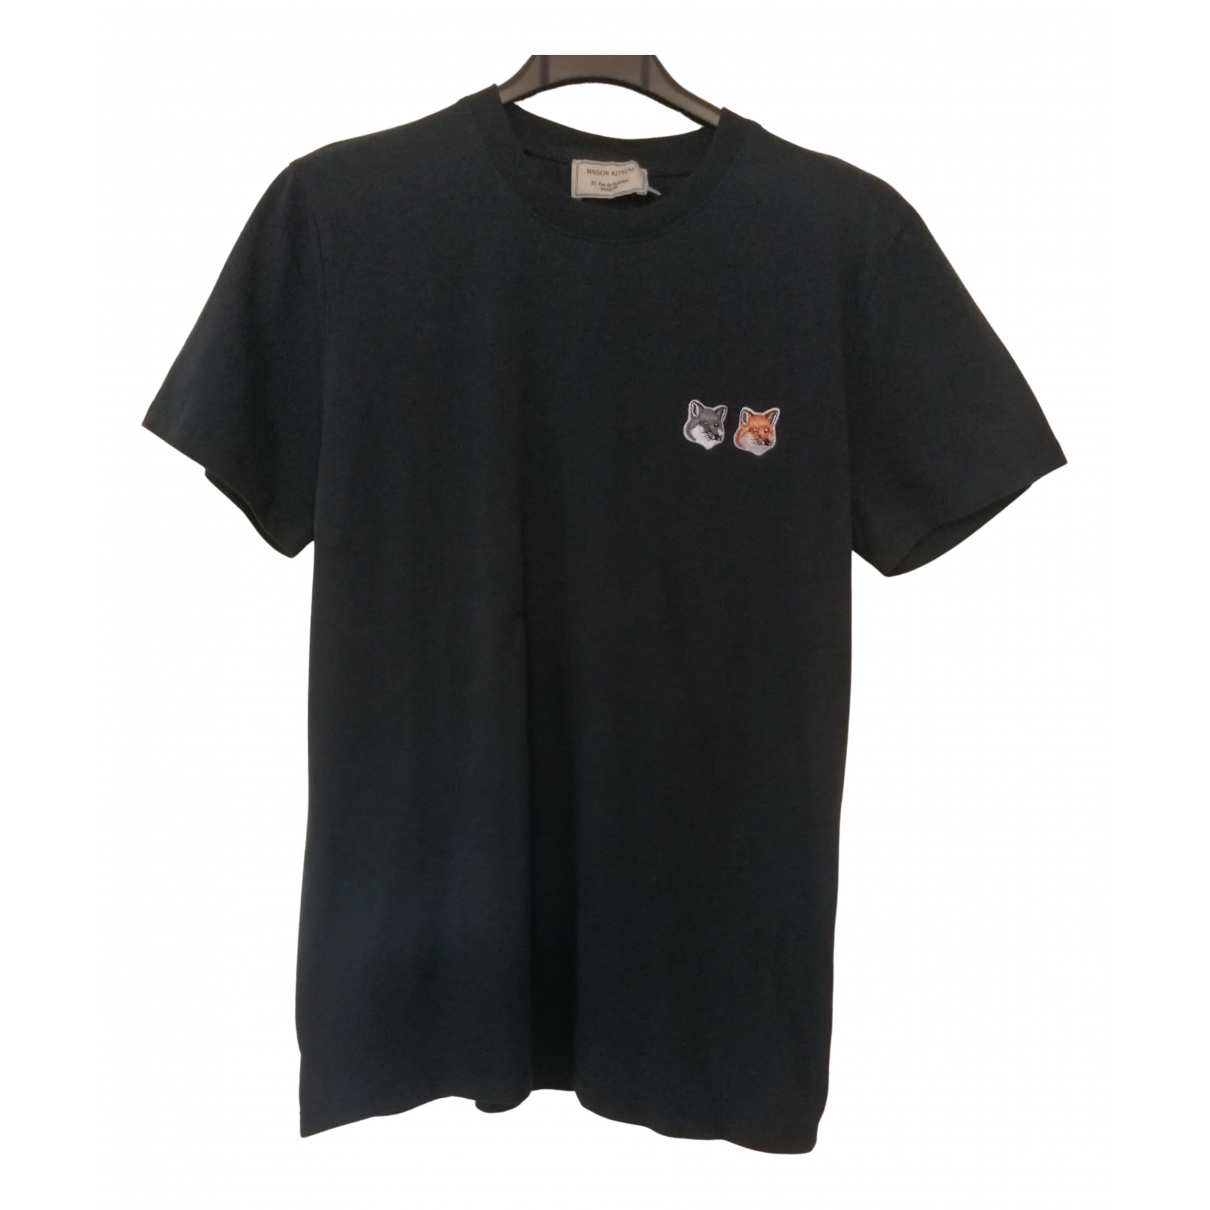 Maison Kitsune \N T-Shirts in  Marine Baumwolle